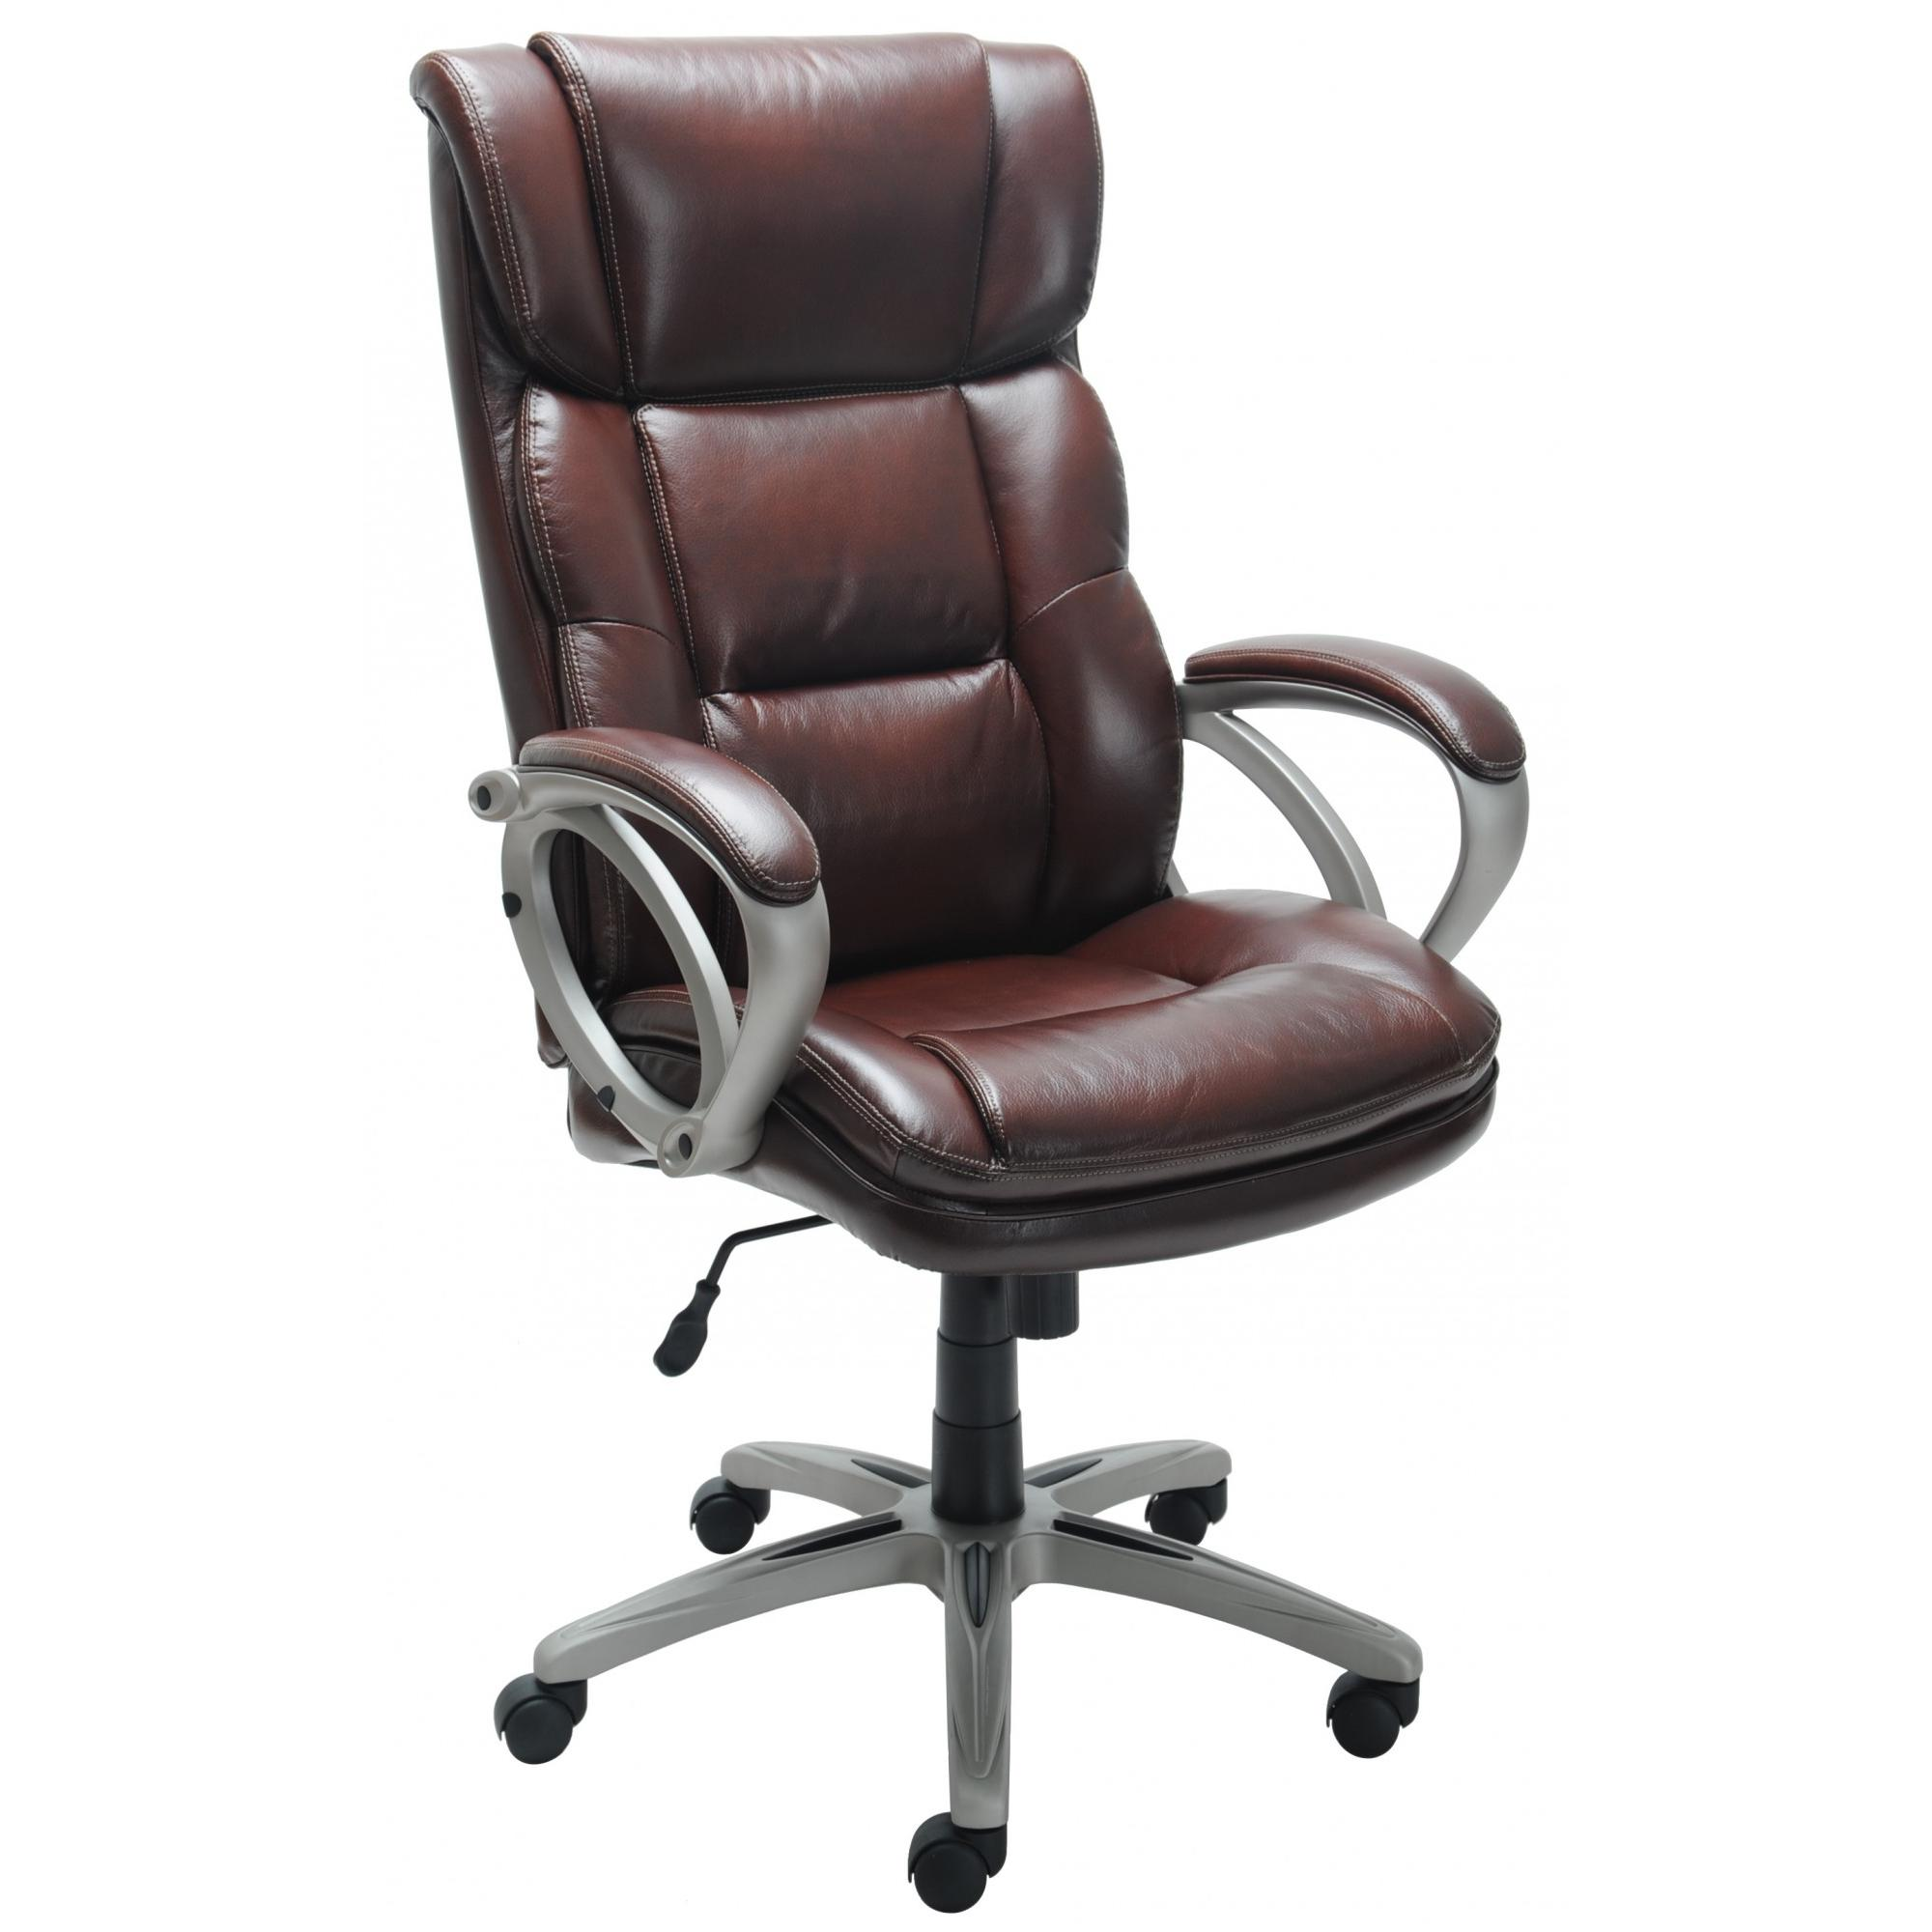 Broyhill Bonded Leather Executive Chair Walmart Com